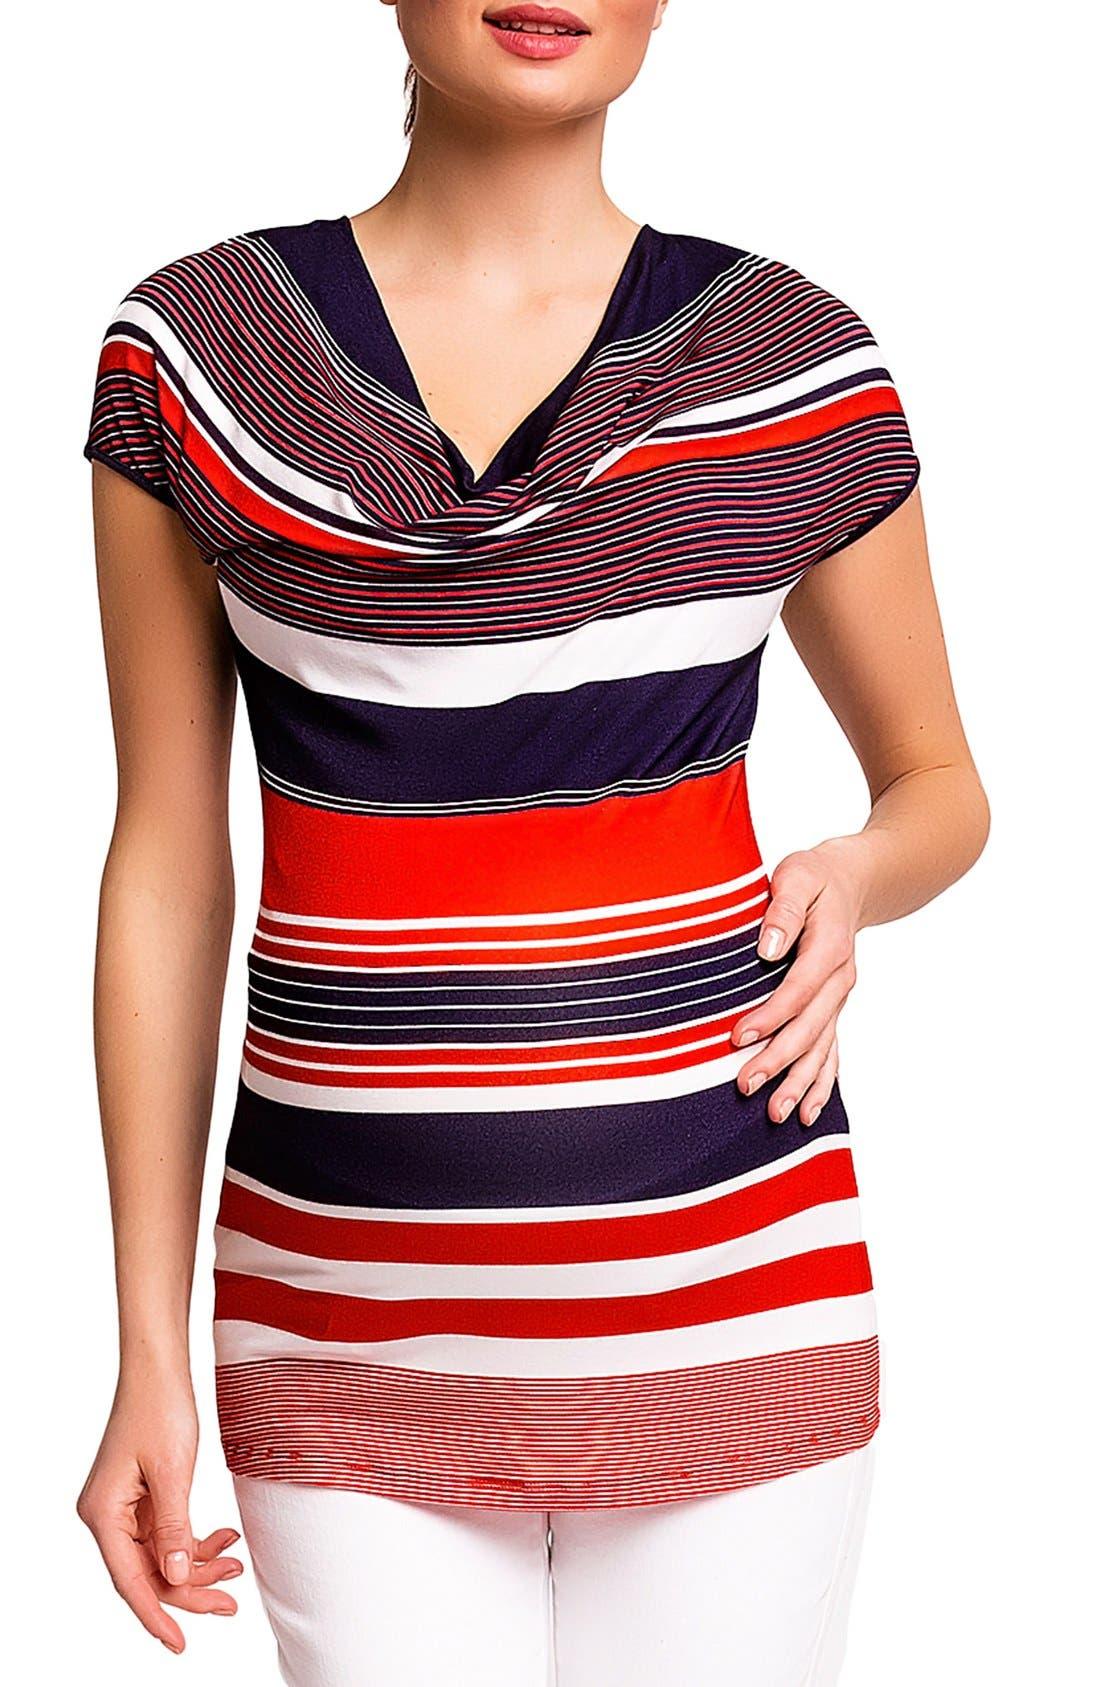 'Ginestra' Maternity/Nursing Tunic,                             Main thumbnail 1, color,                             Red/Blue Stripes